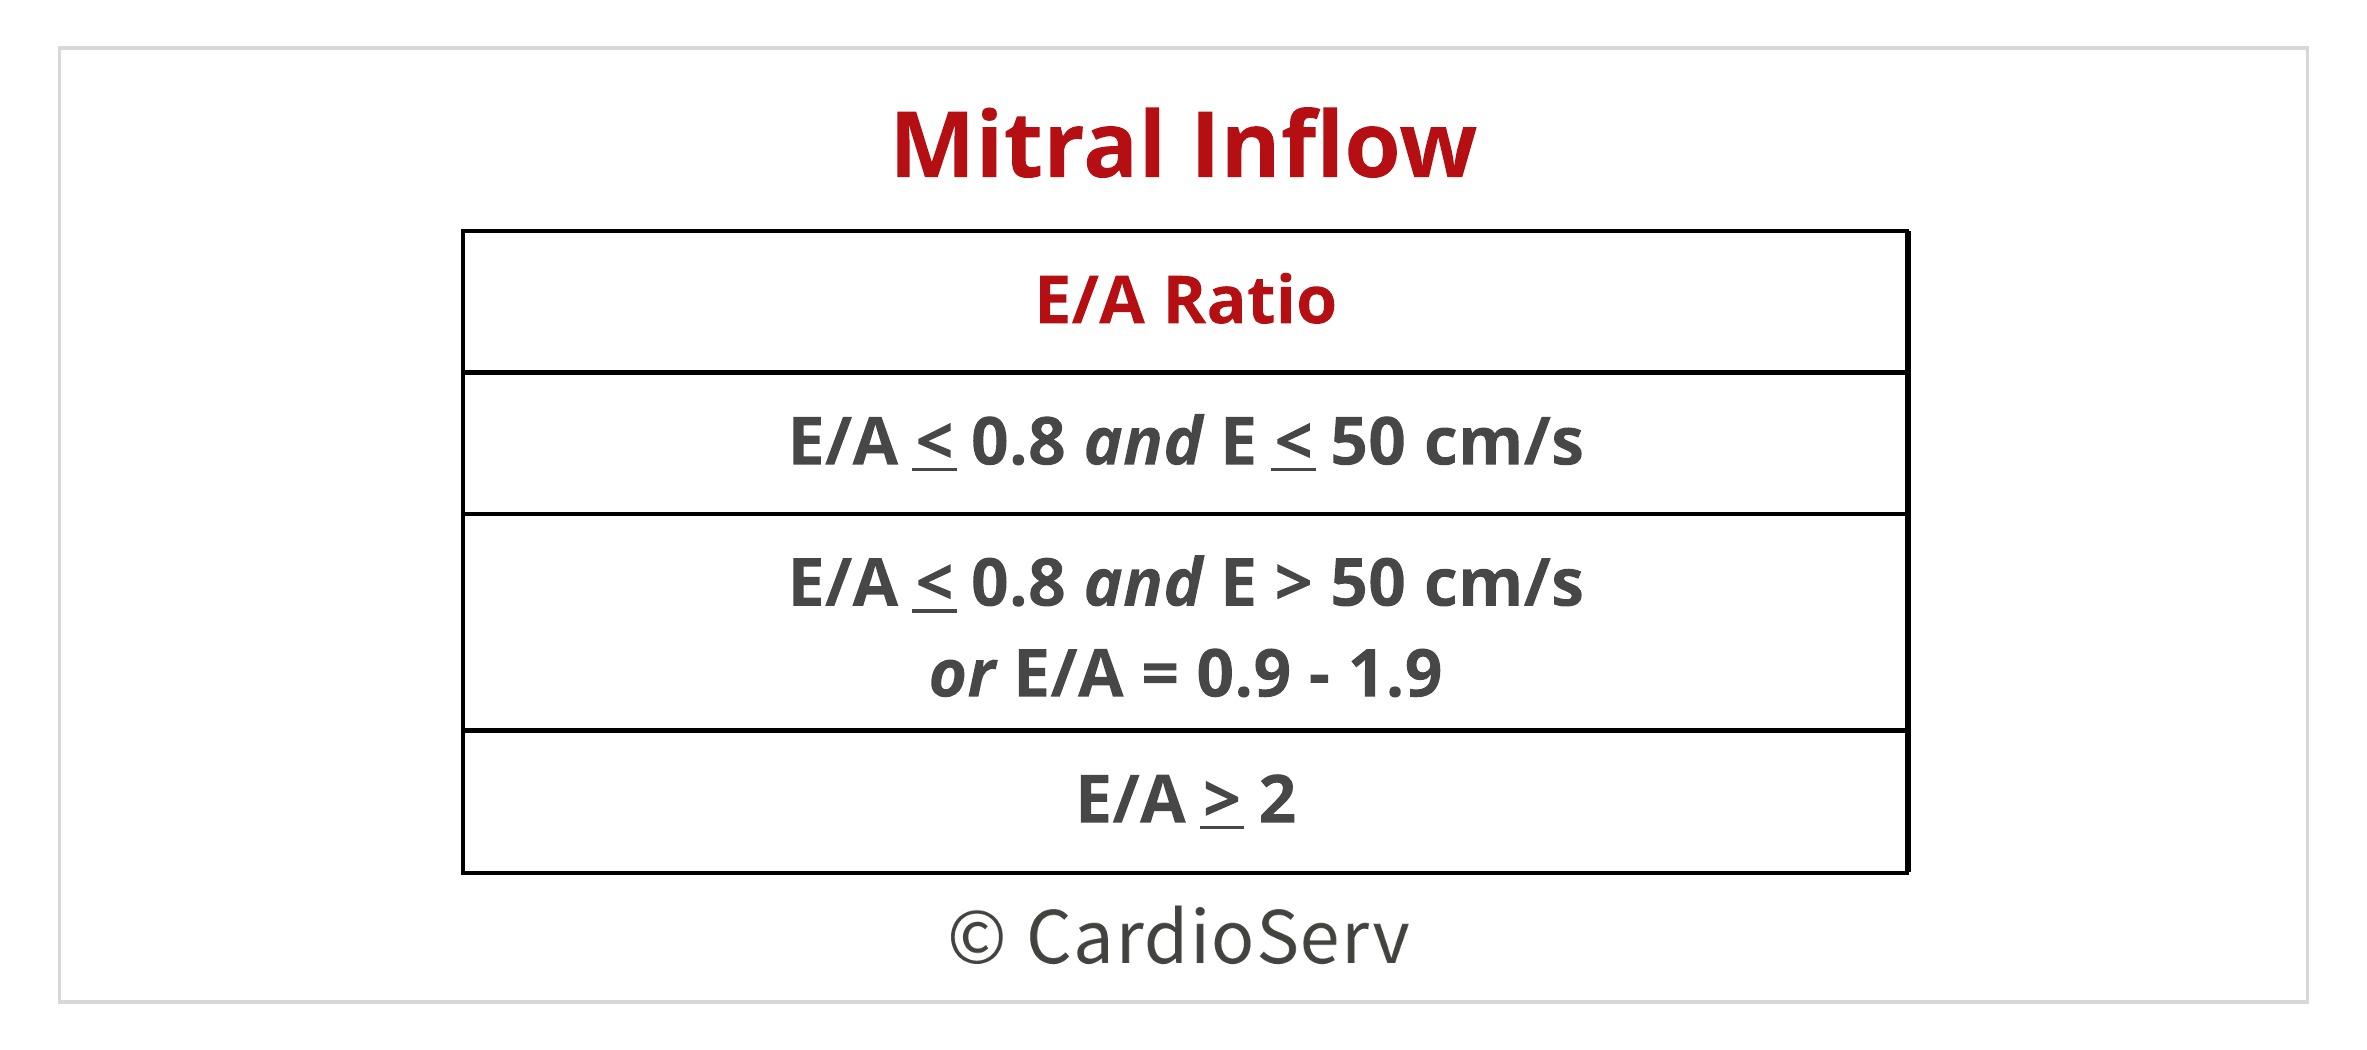 Mitral Inflow E/A Ratio Diastolic Function